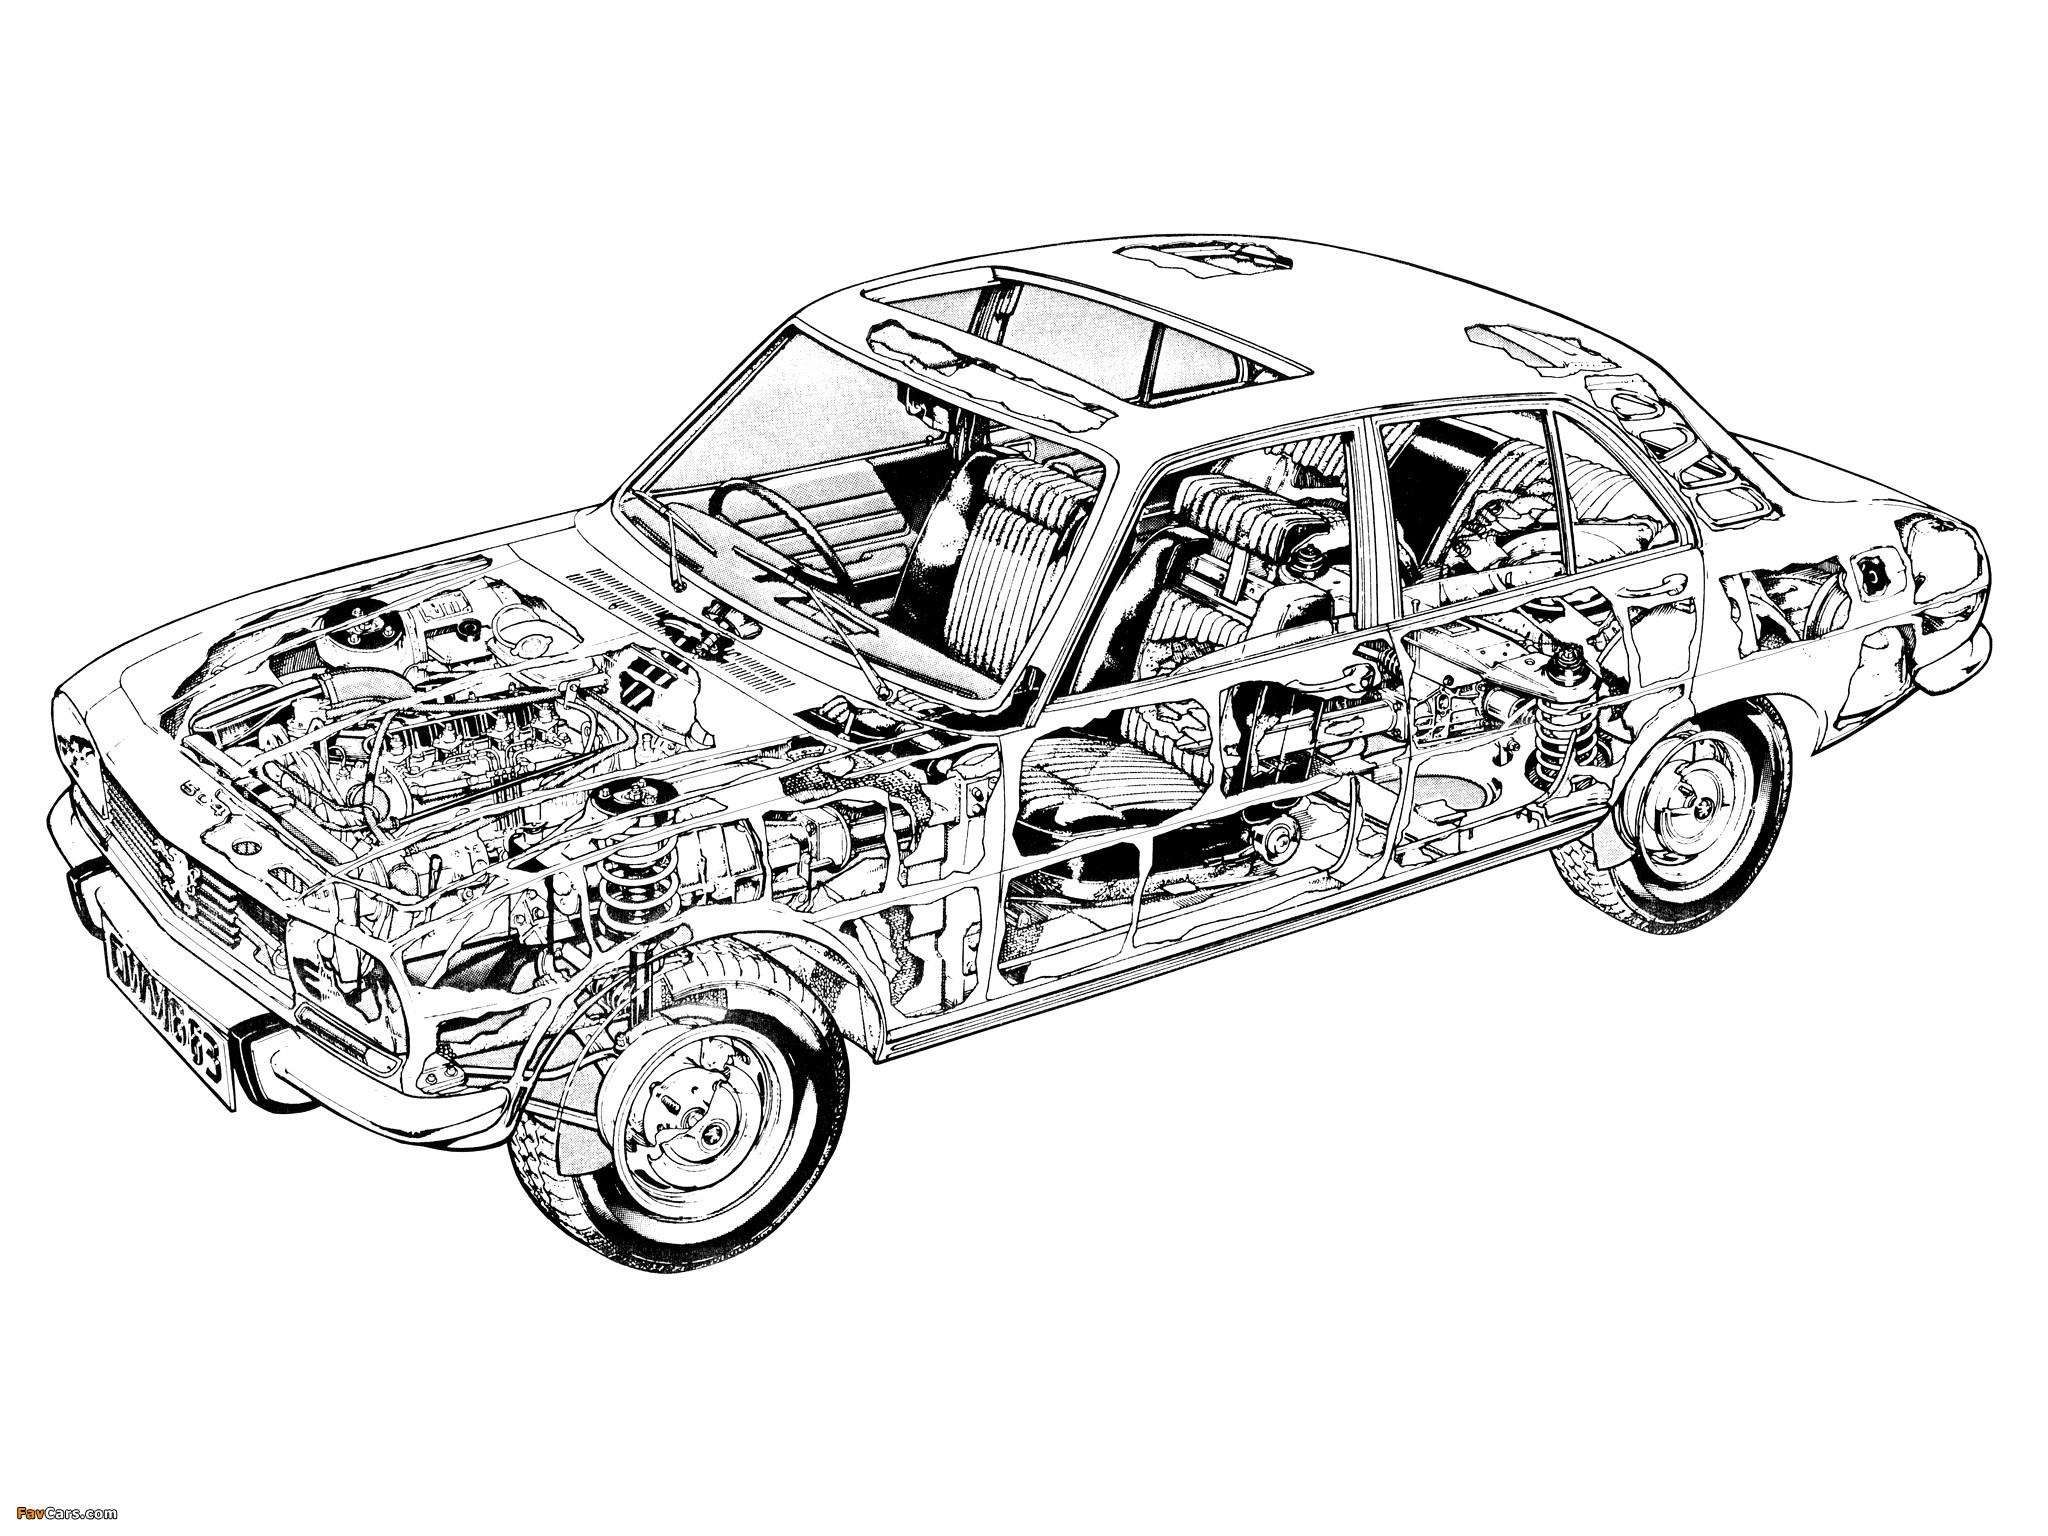 [DIAGRAM] Bmw M30 Engine Diagram FULL Version HD Quality